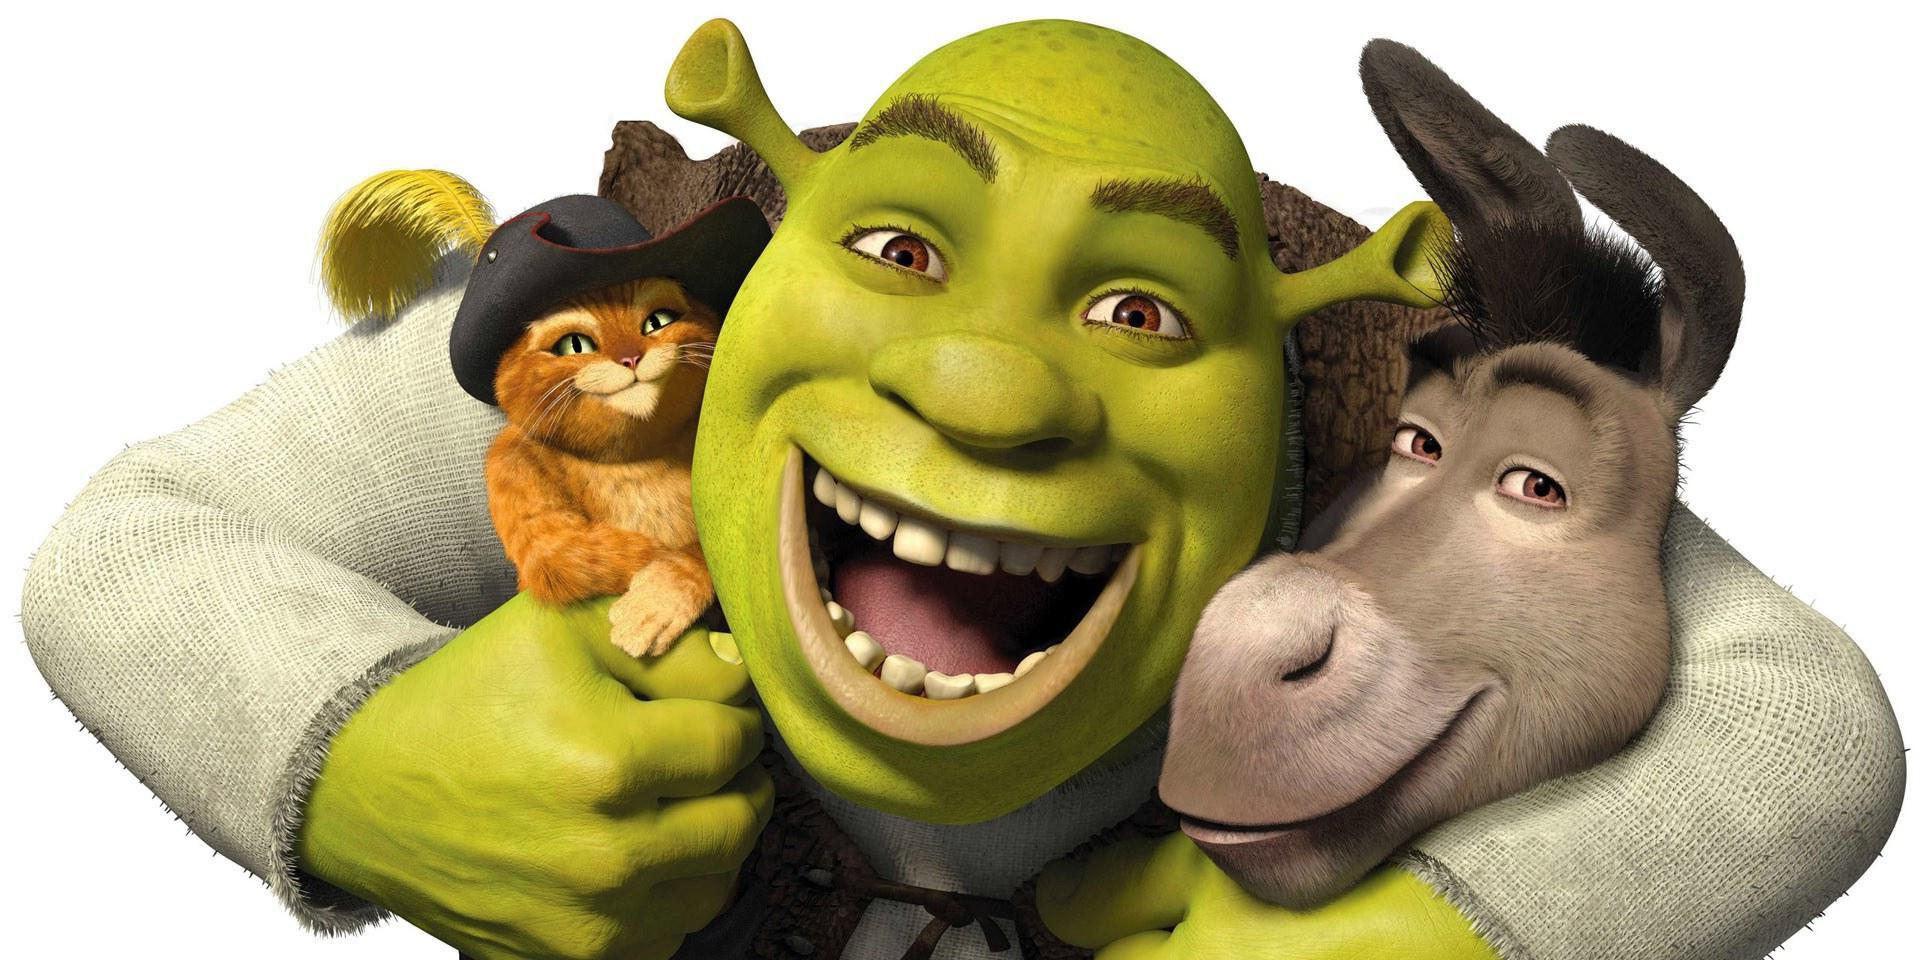 Shrek Wallpapers High Quality